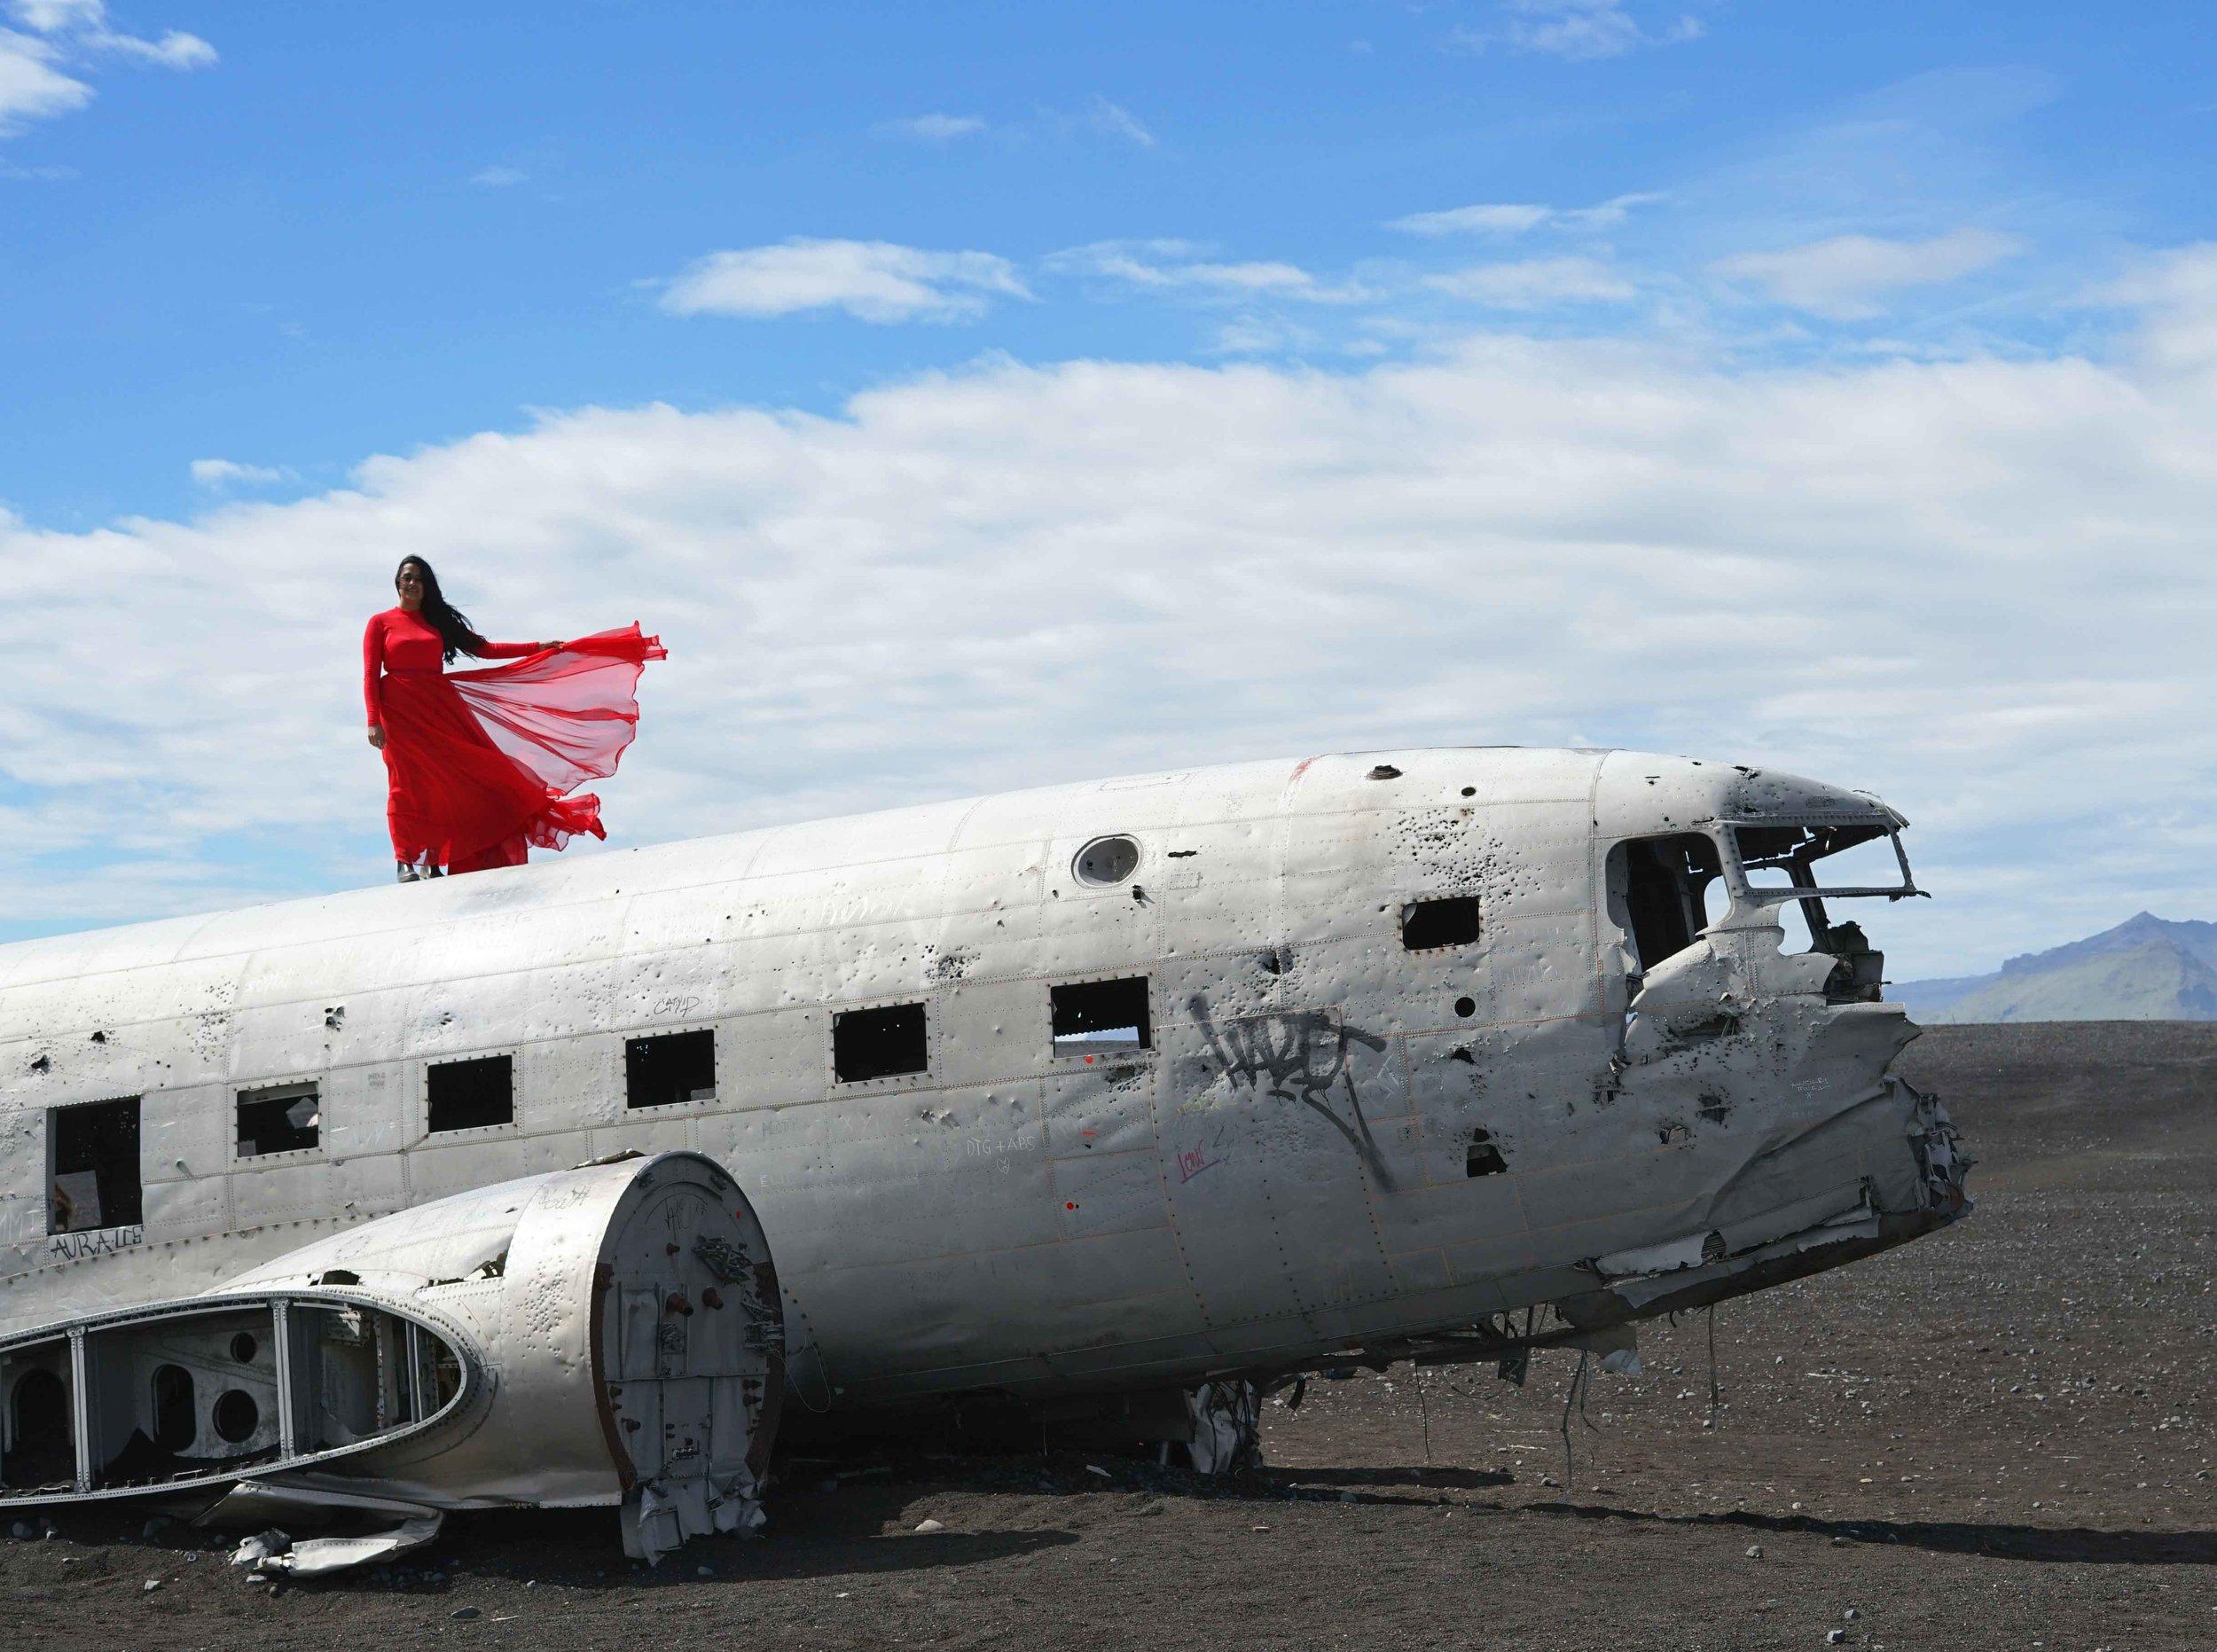 Solheimasandur plane crash Iceland travel guide charisma shah